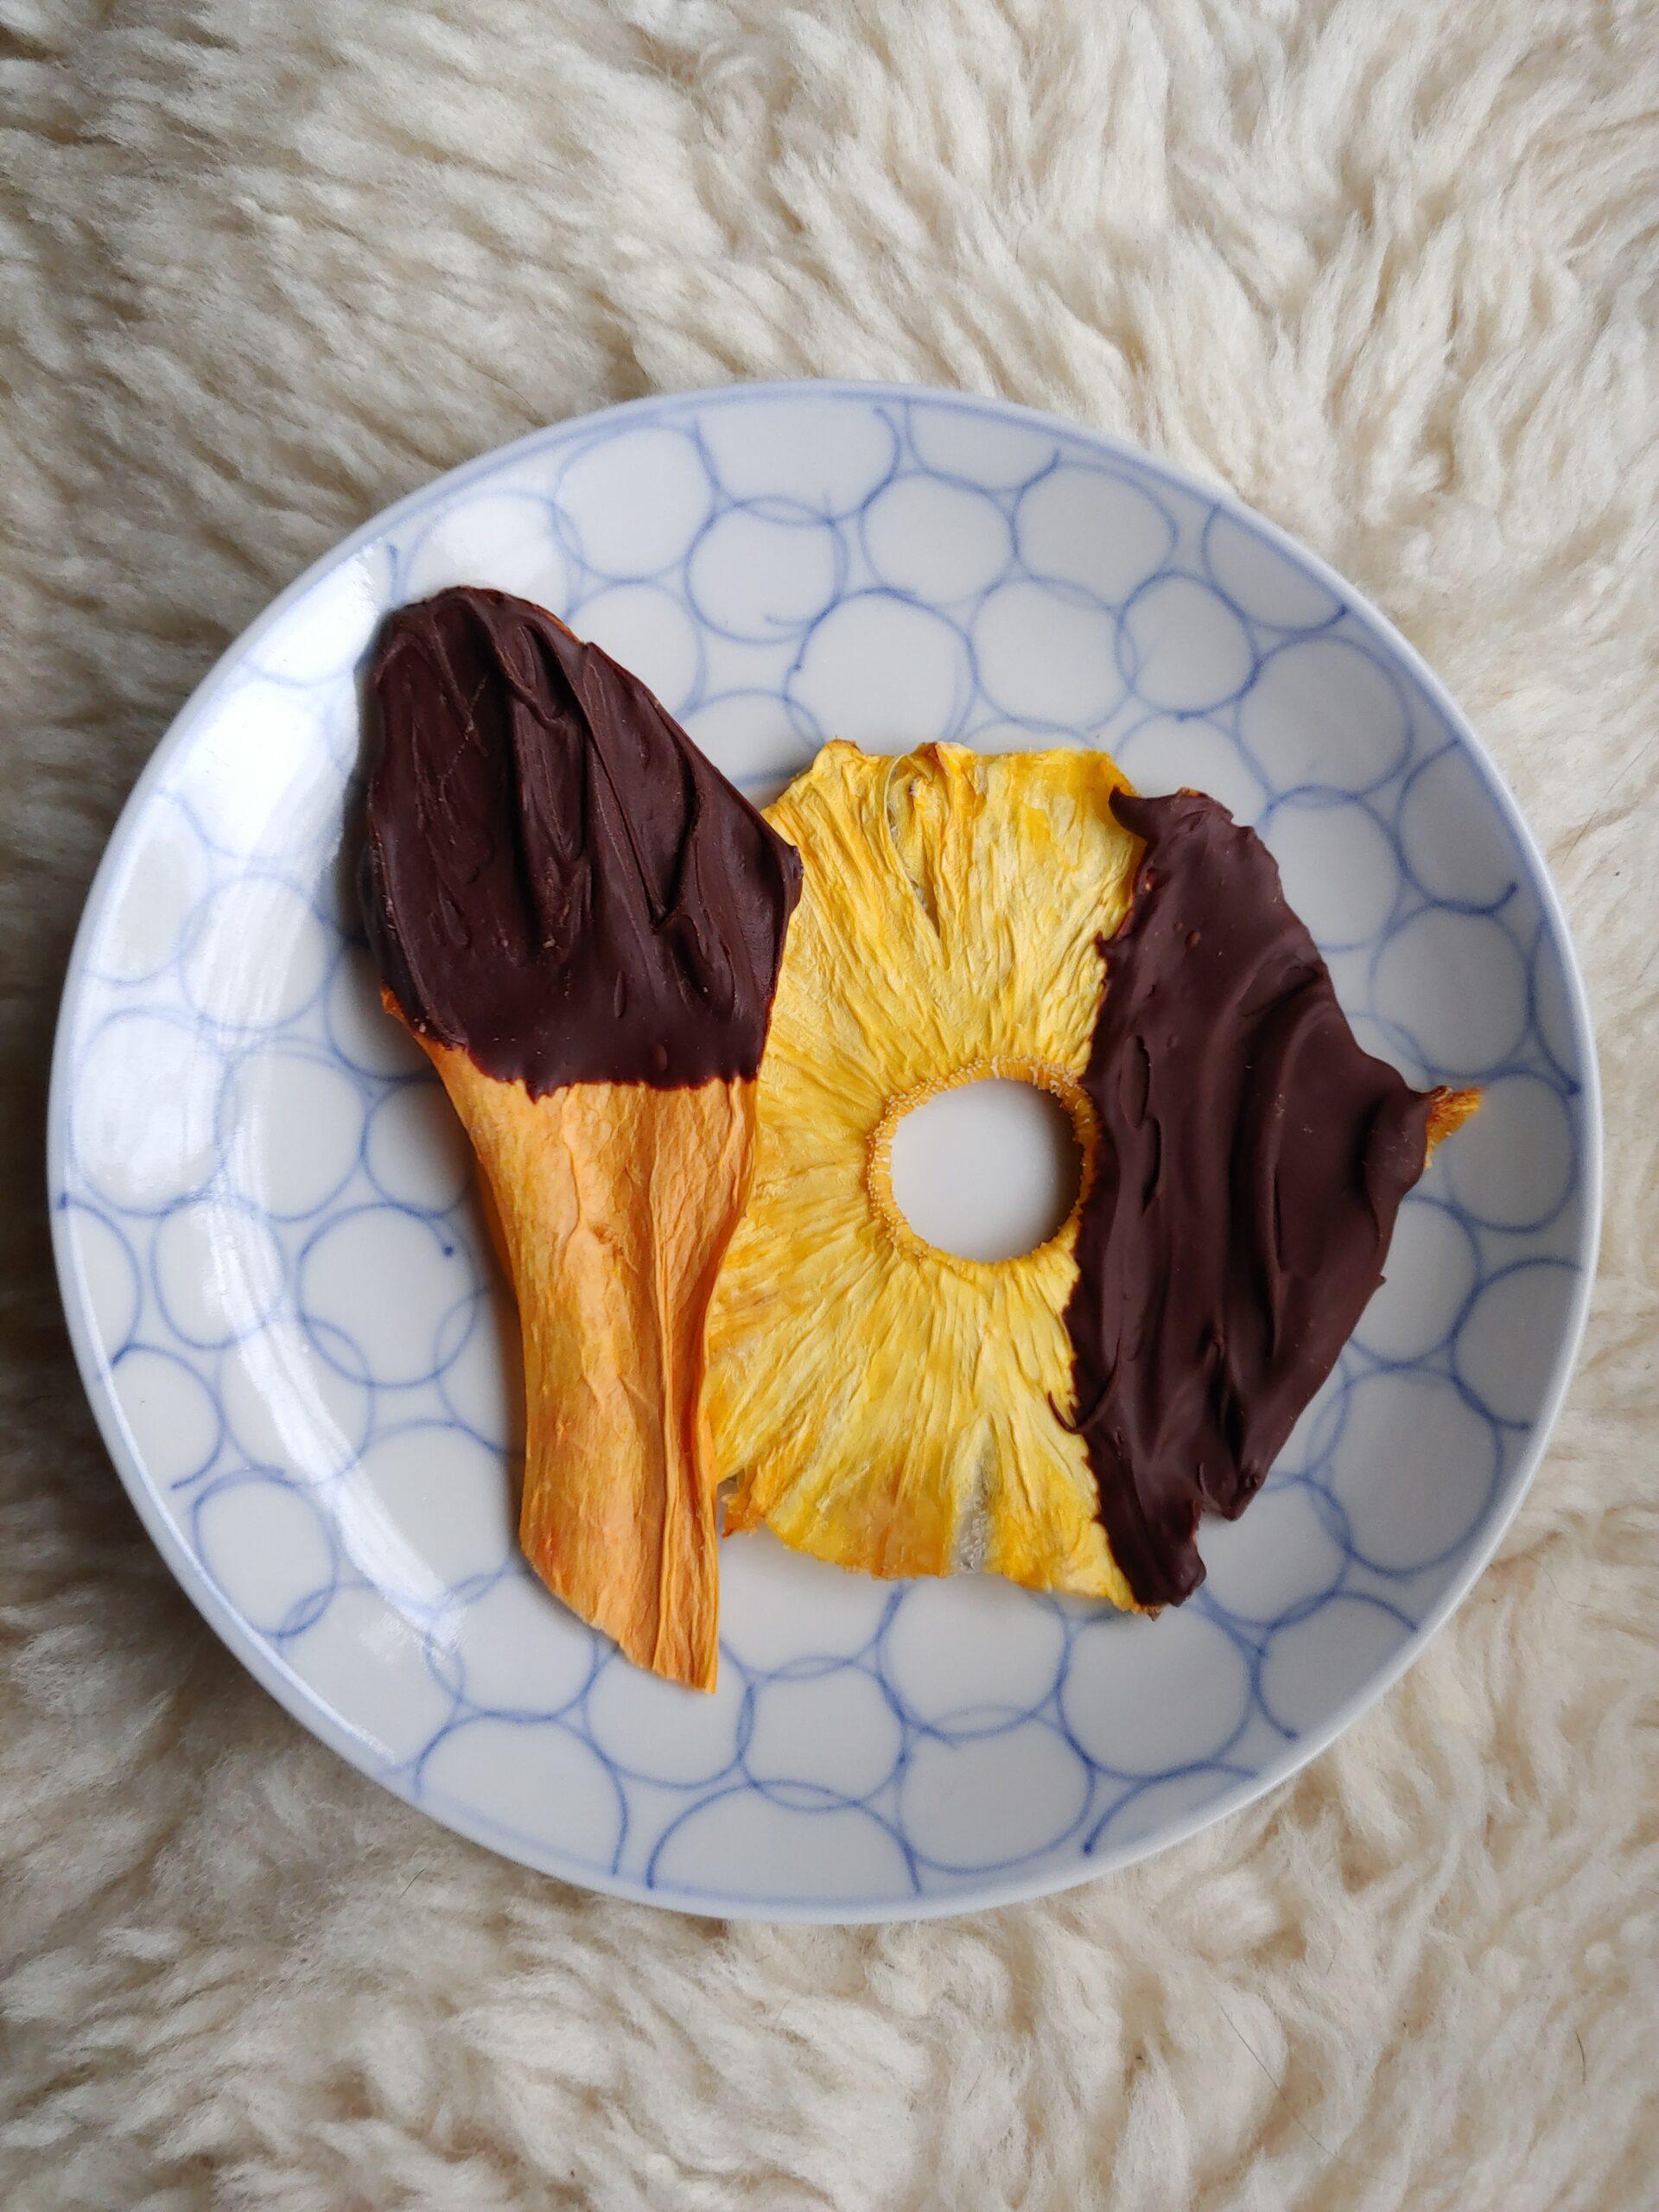 Raw Vegan Chocolate Dipped Dehydrated Fruit